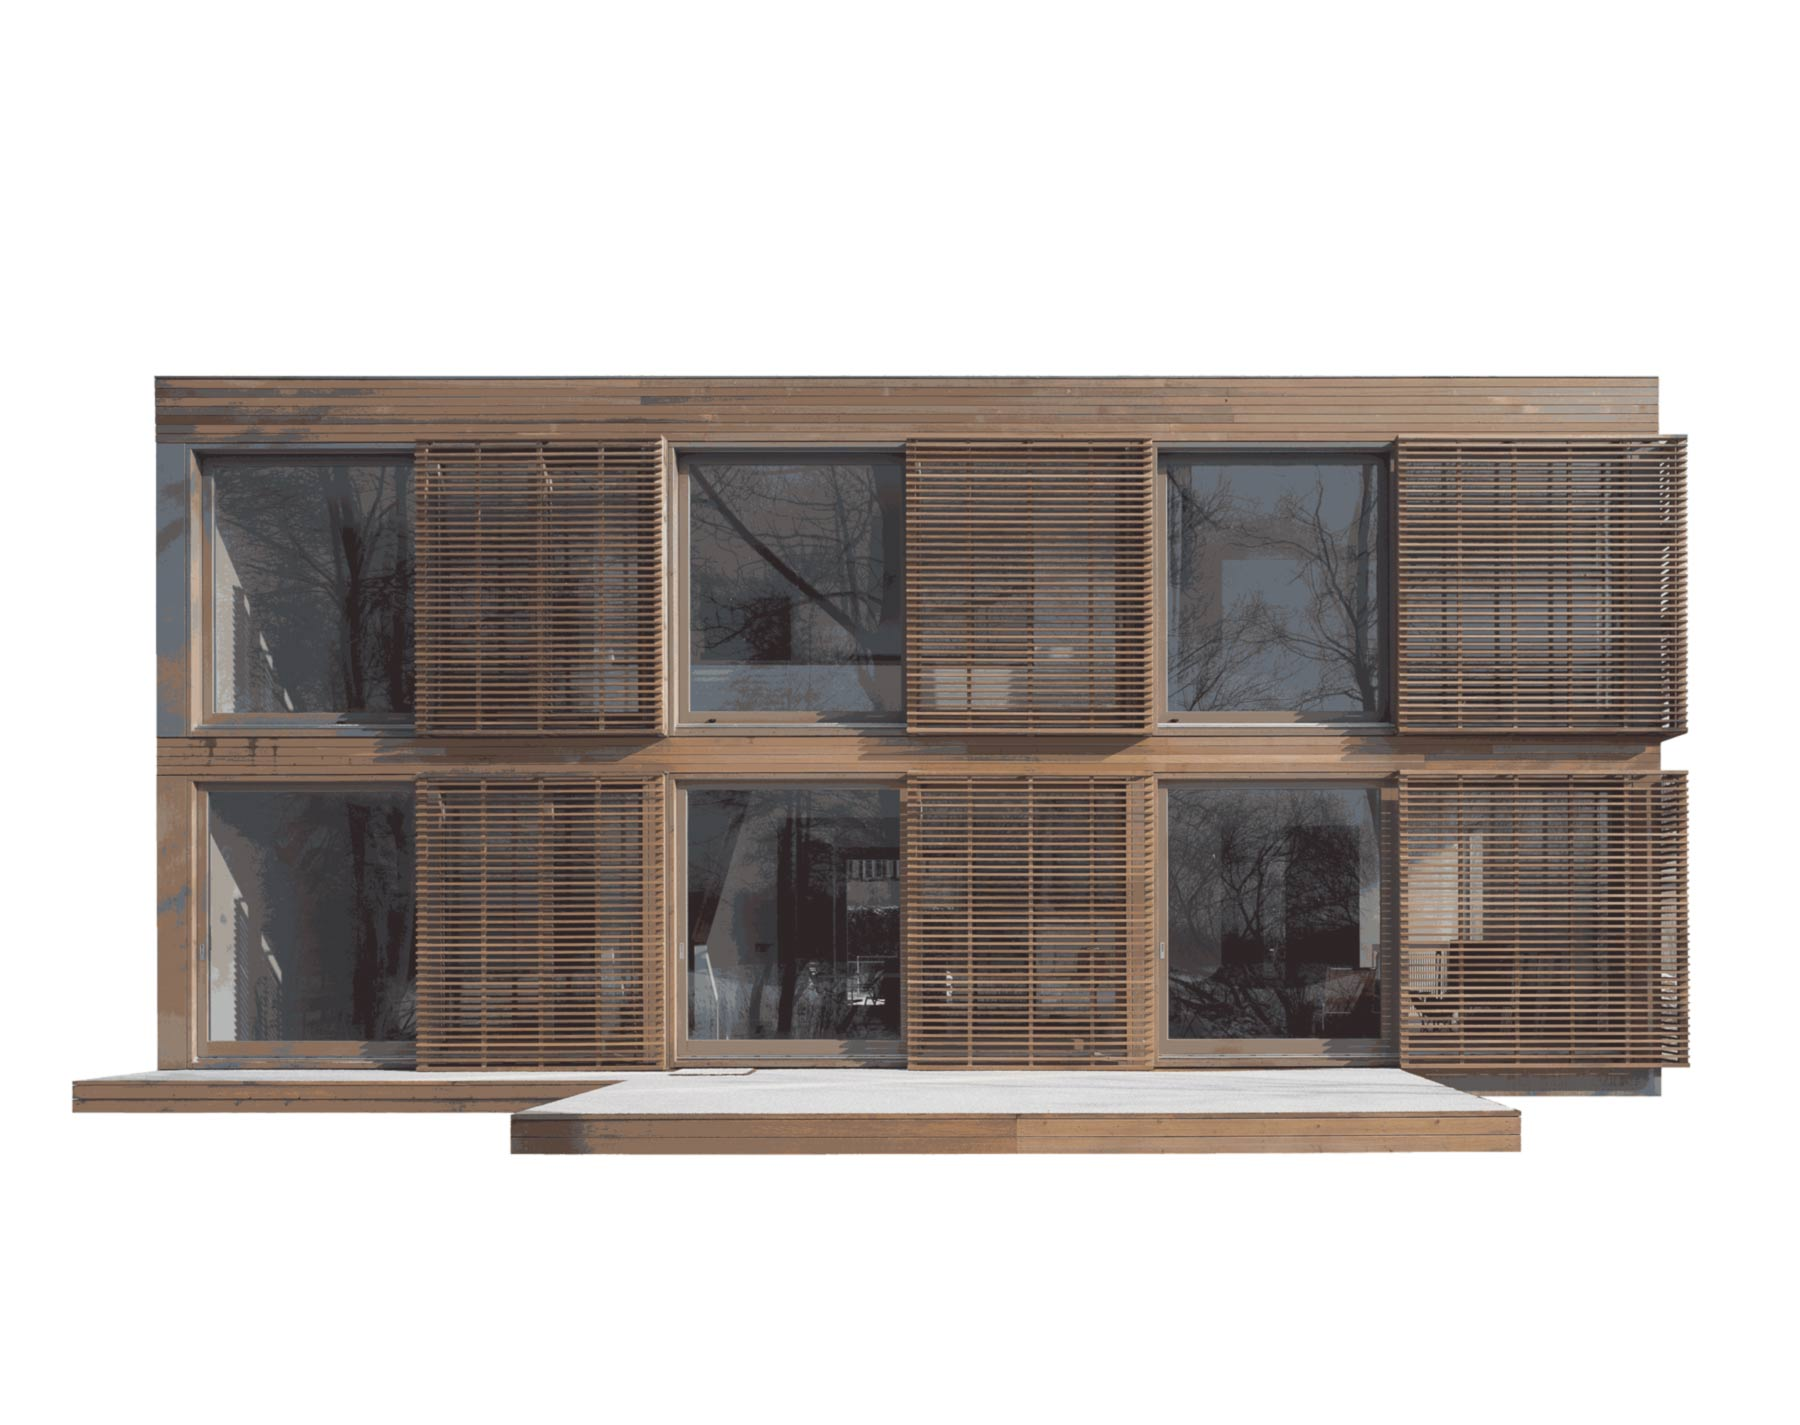 klaus-schlosser-architects-HAEMPHORN-SACROW_0_Teaser